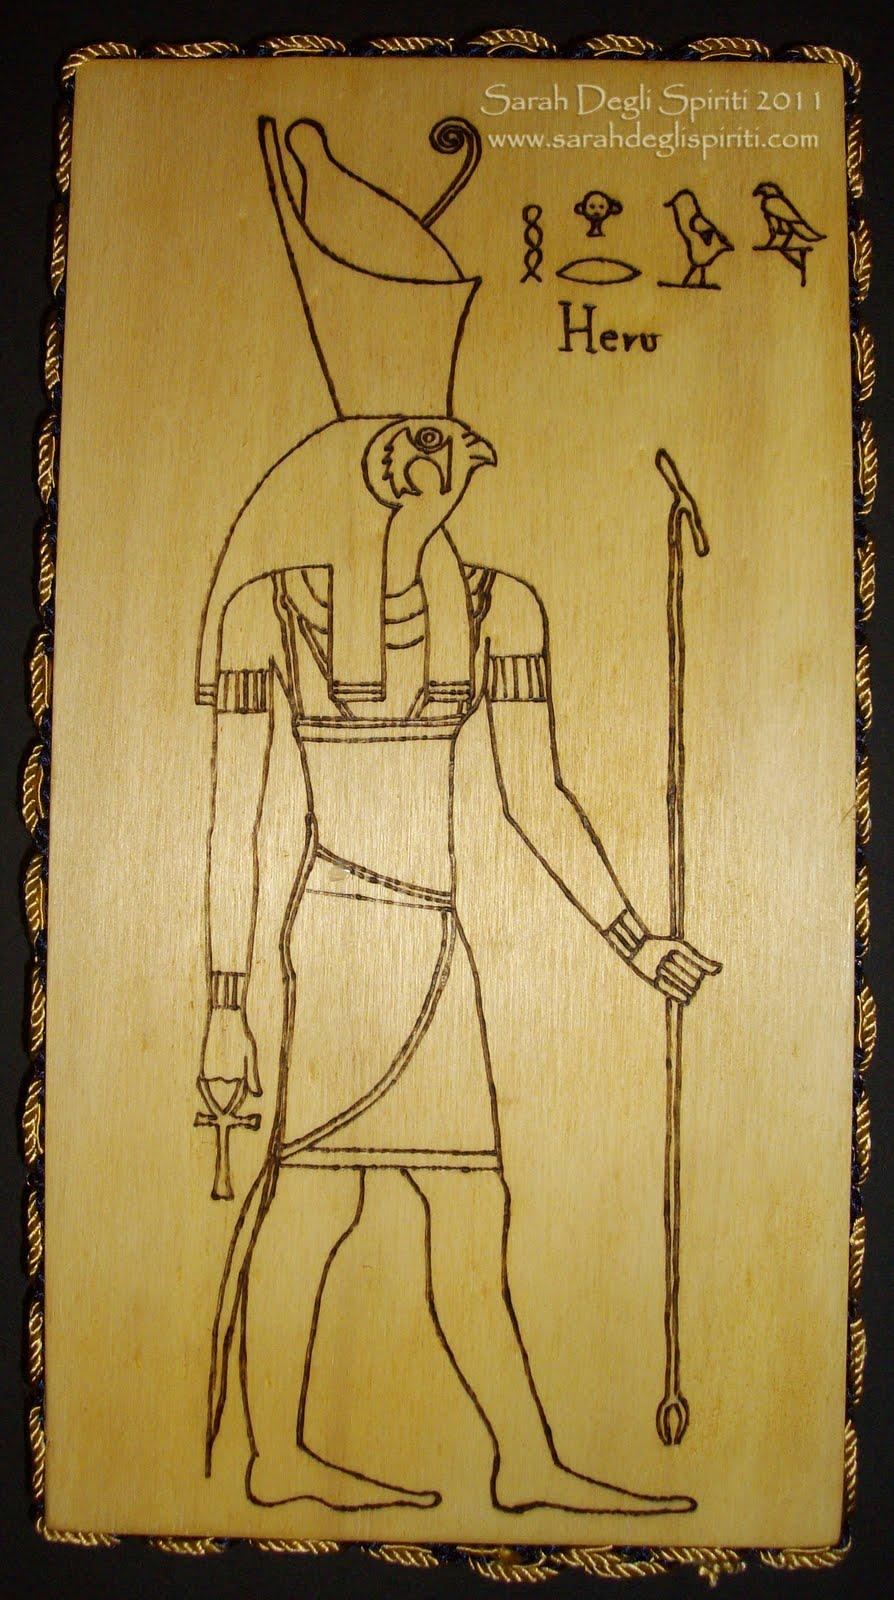 Heru/Horus